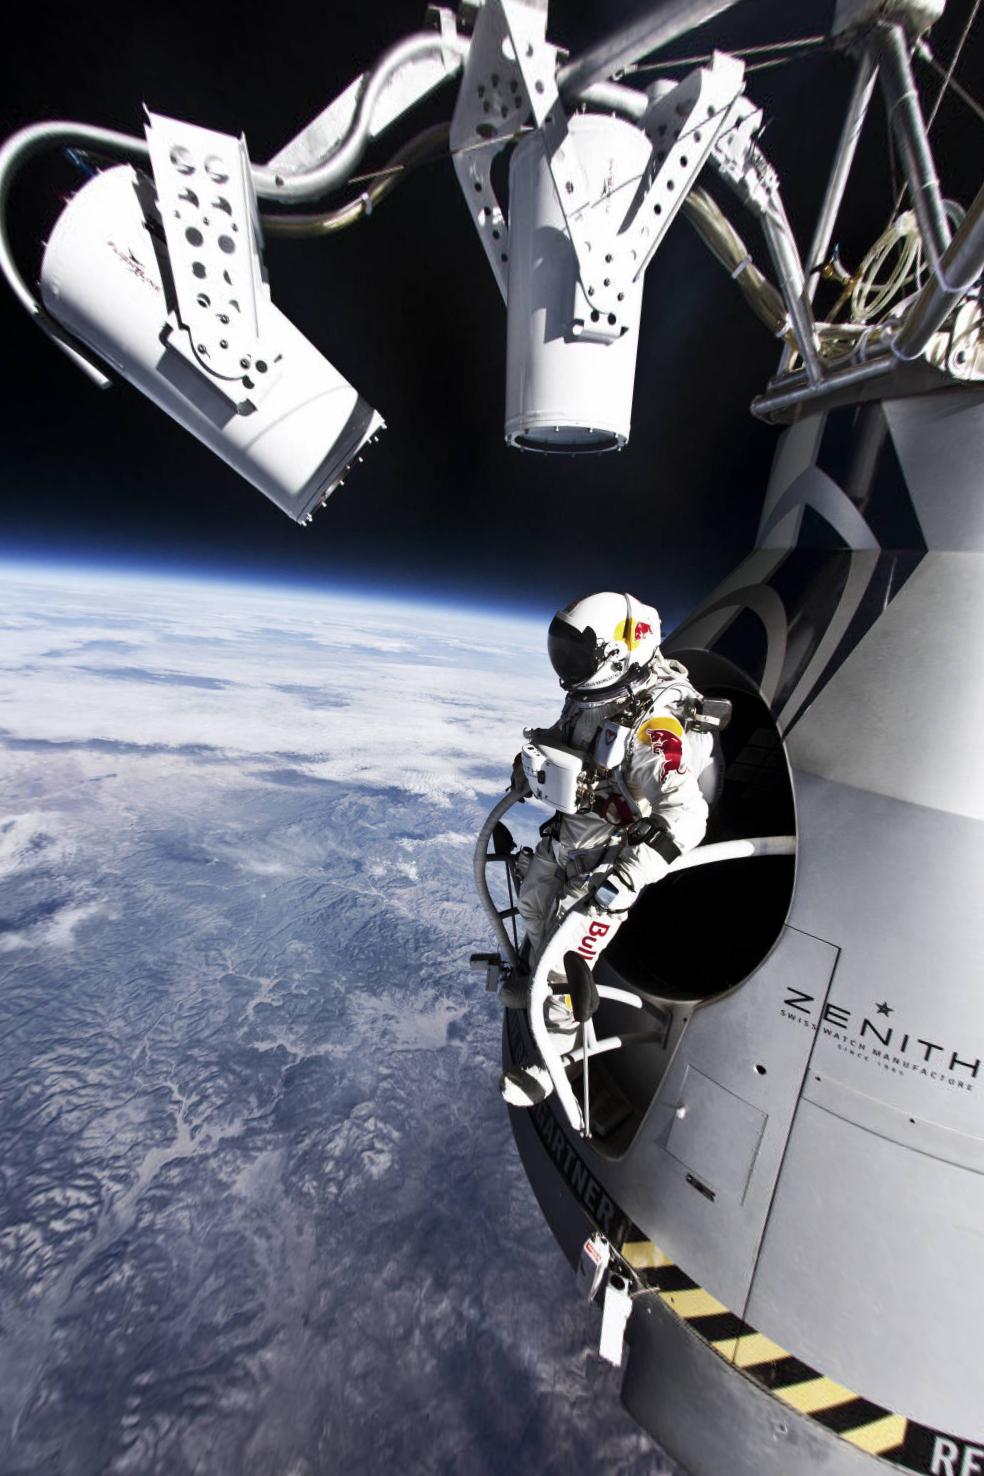 Baumgartner real jump corrected.jpg